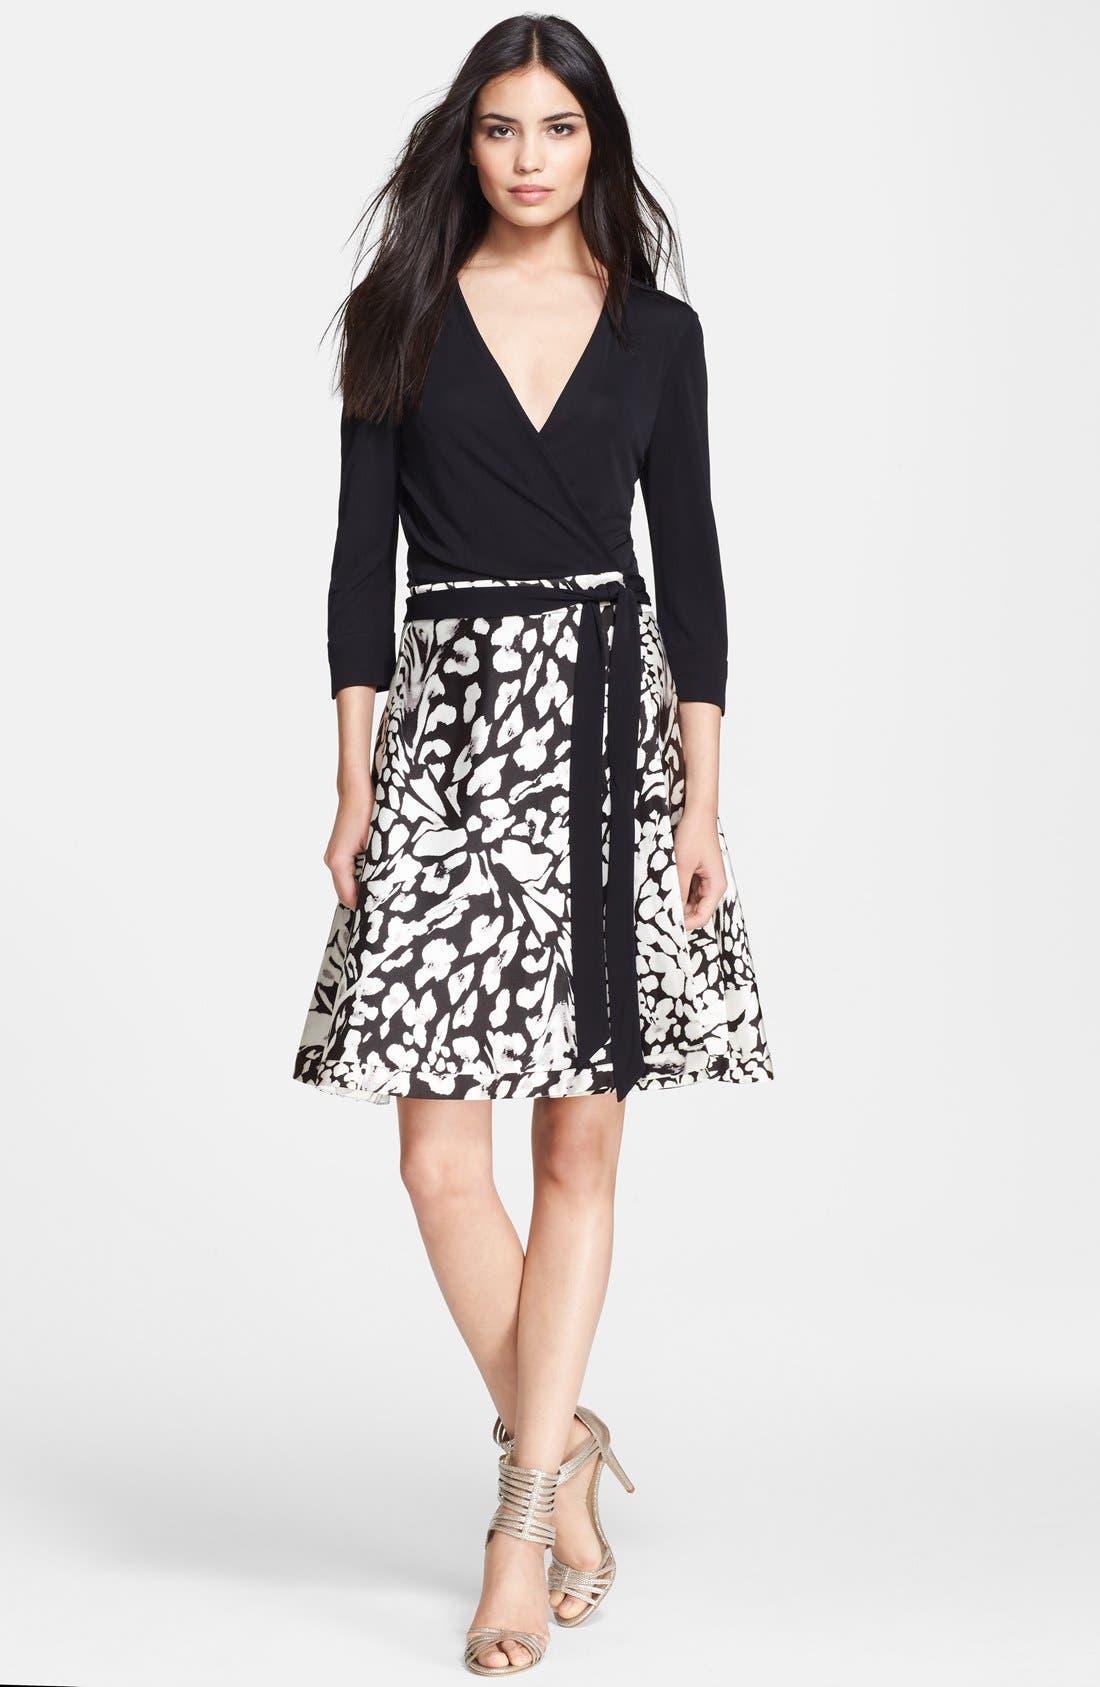 Alternate Image 1 Selected - Diane von Furstenberg 'Amelia' Cotton Blend Wrap Dress